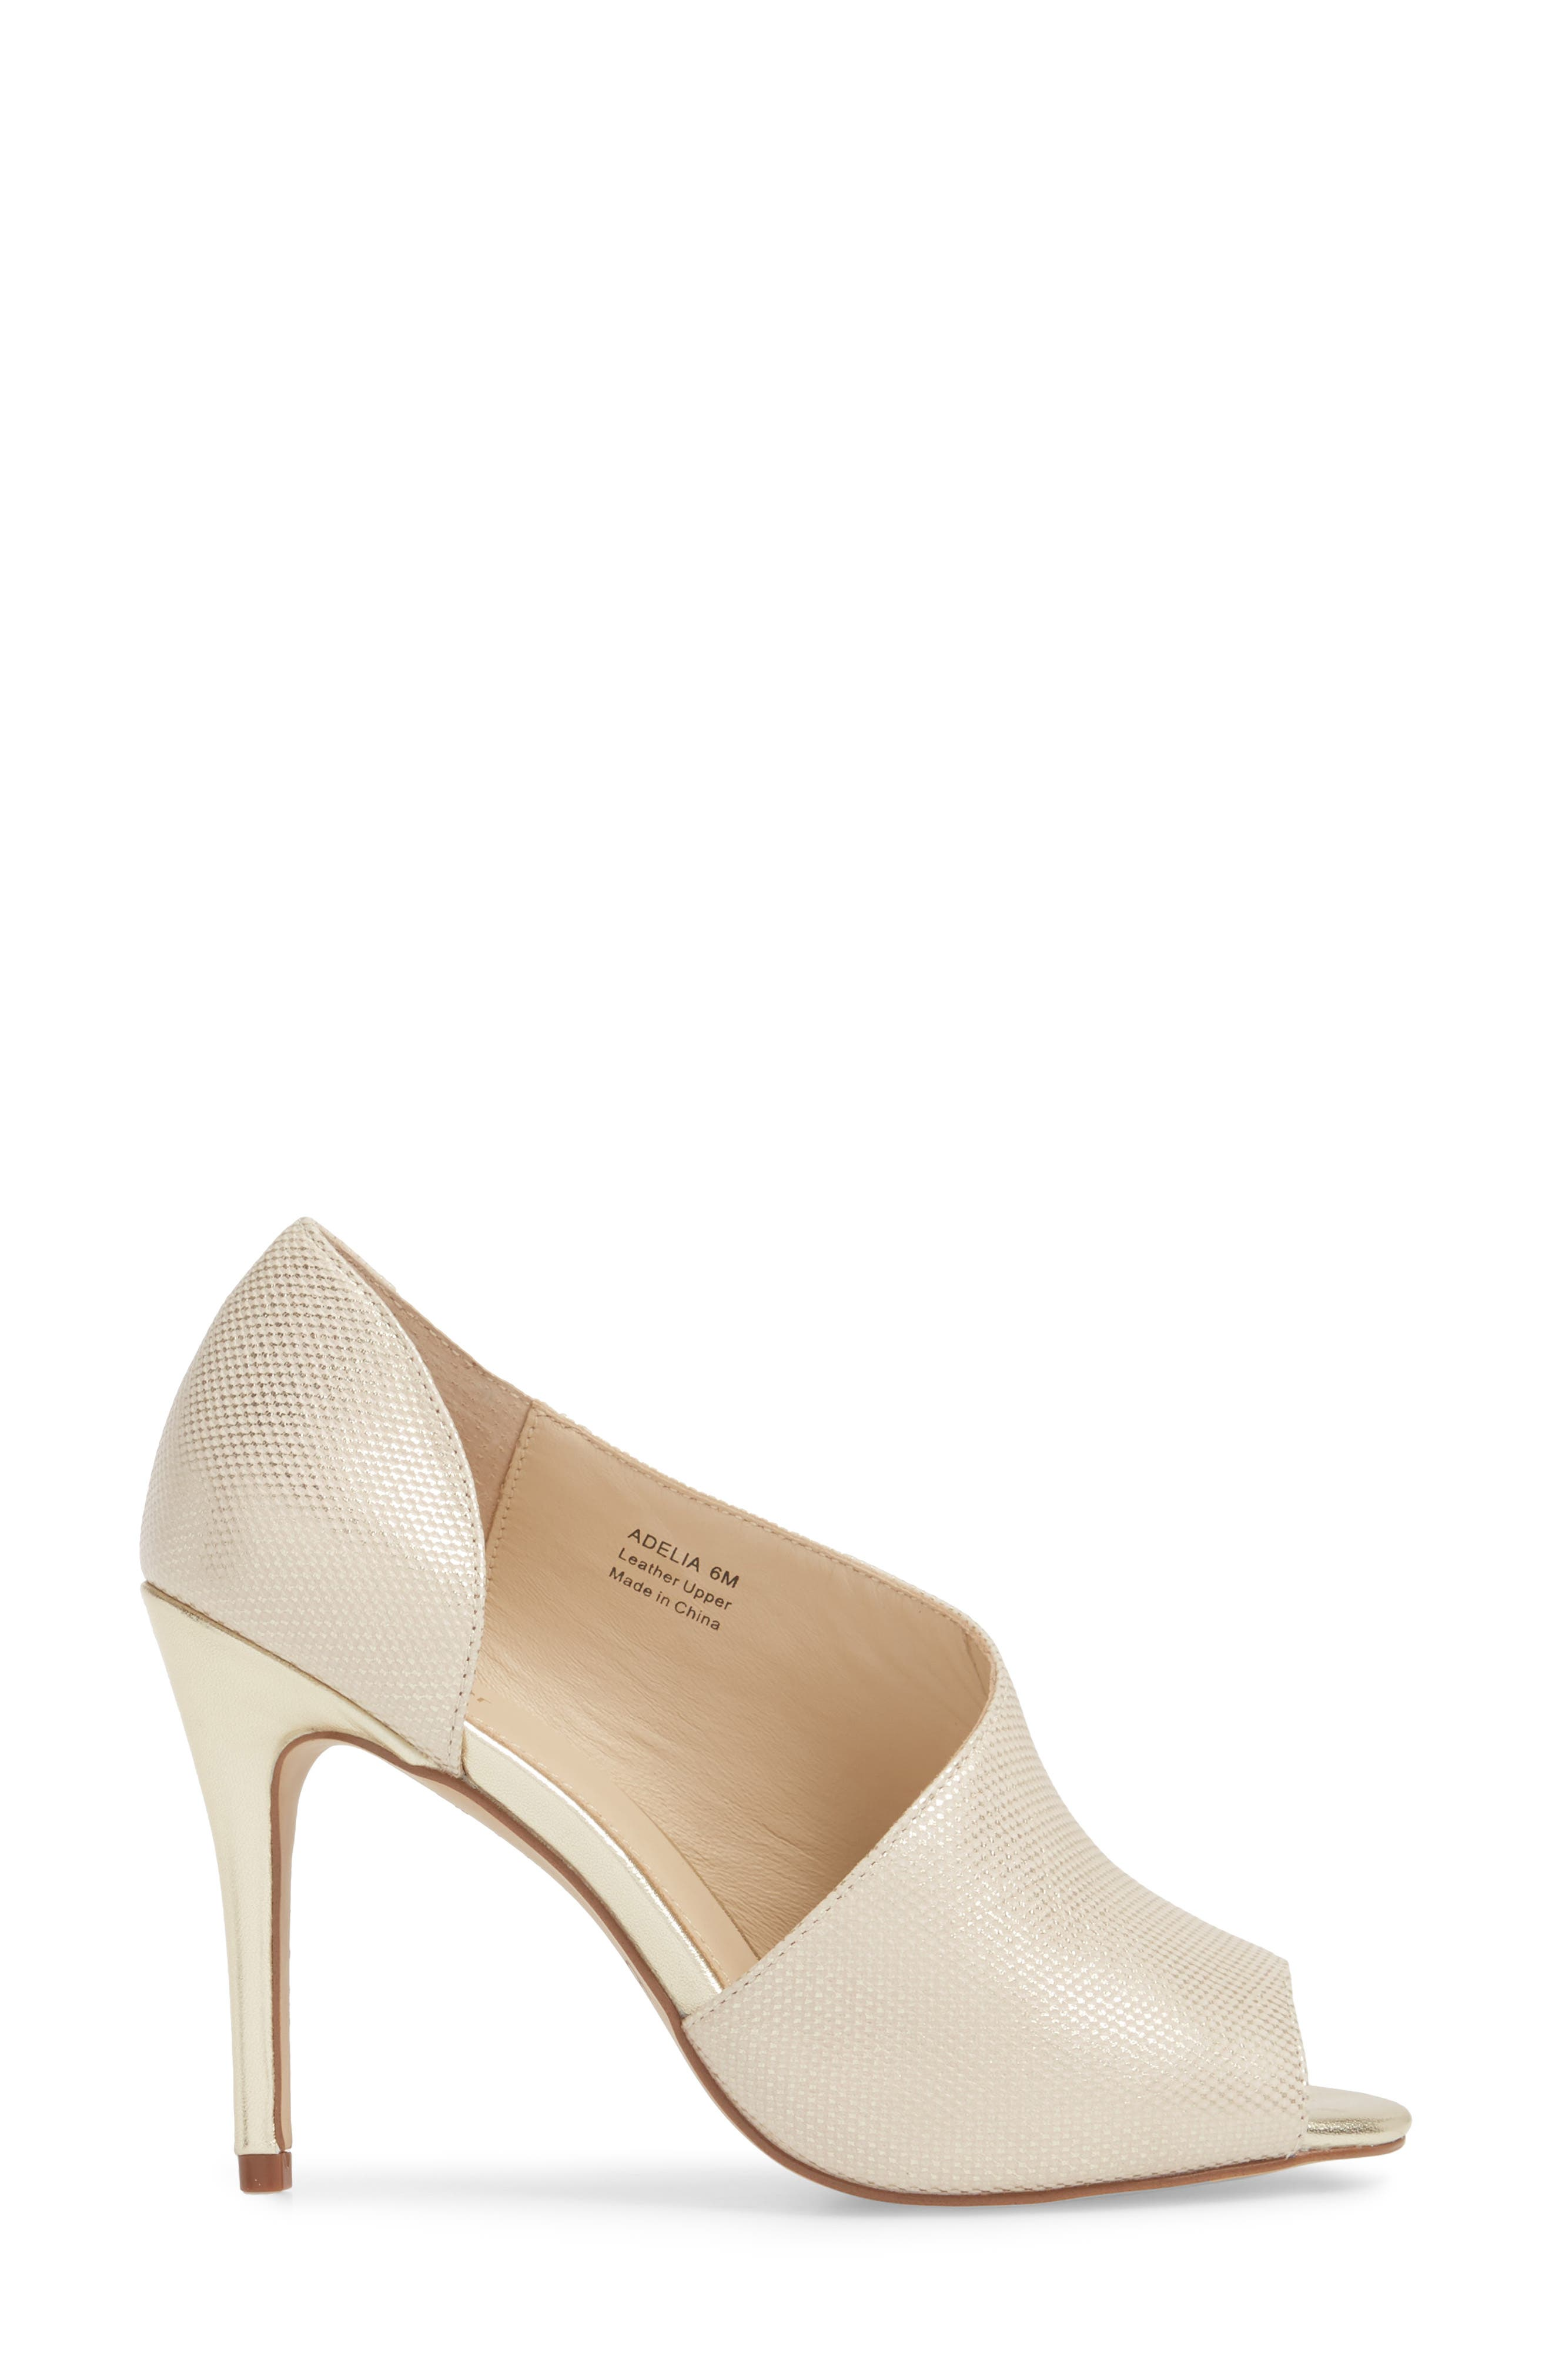 Adelia Asymmetrical Sandal,                             Alternate thumbnail 3, color,                             Gold Shimmer Fabric